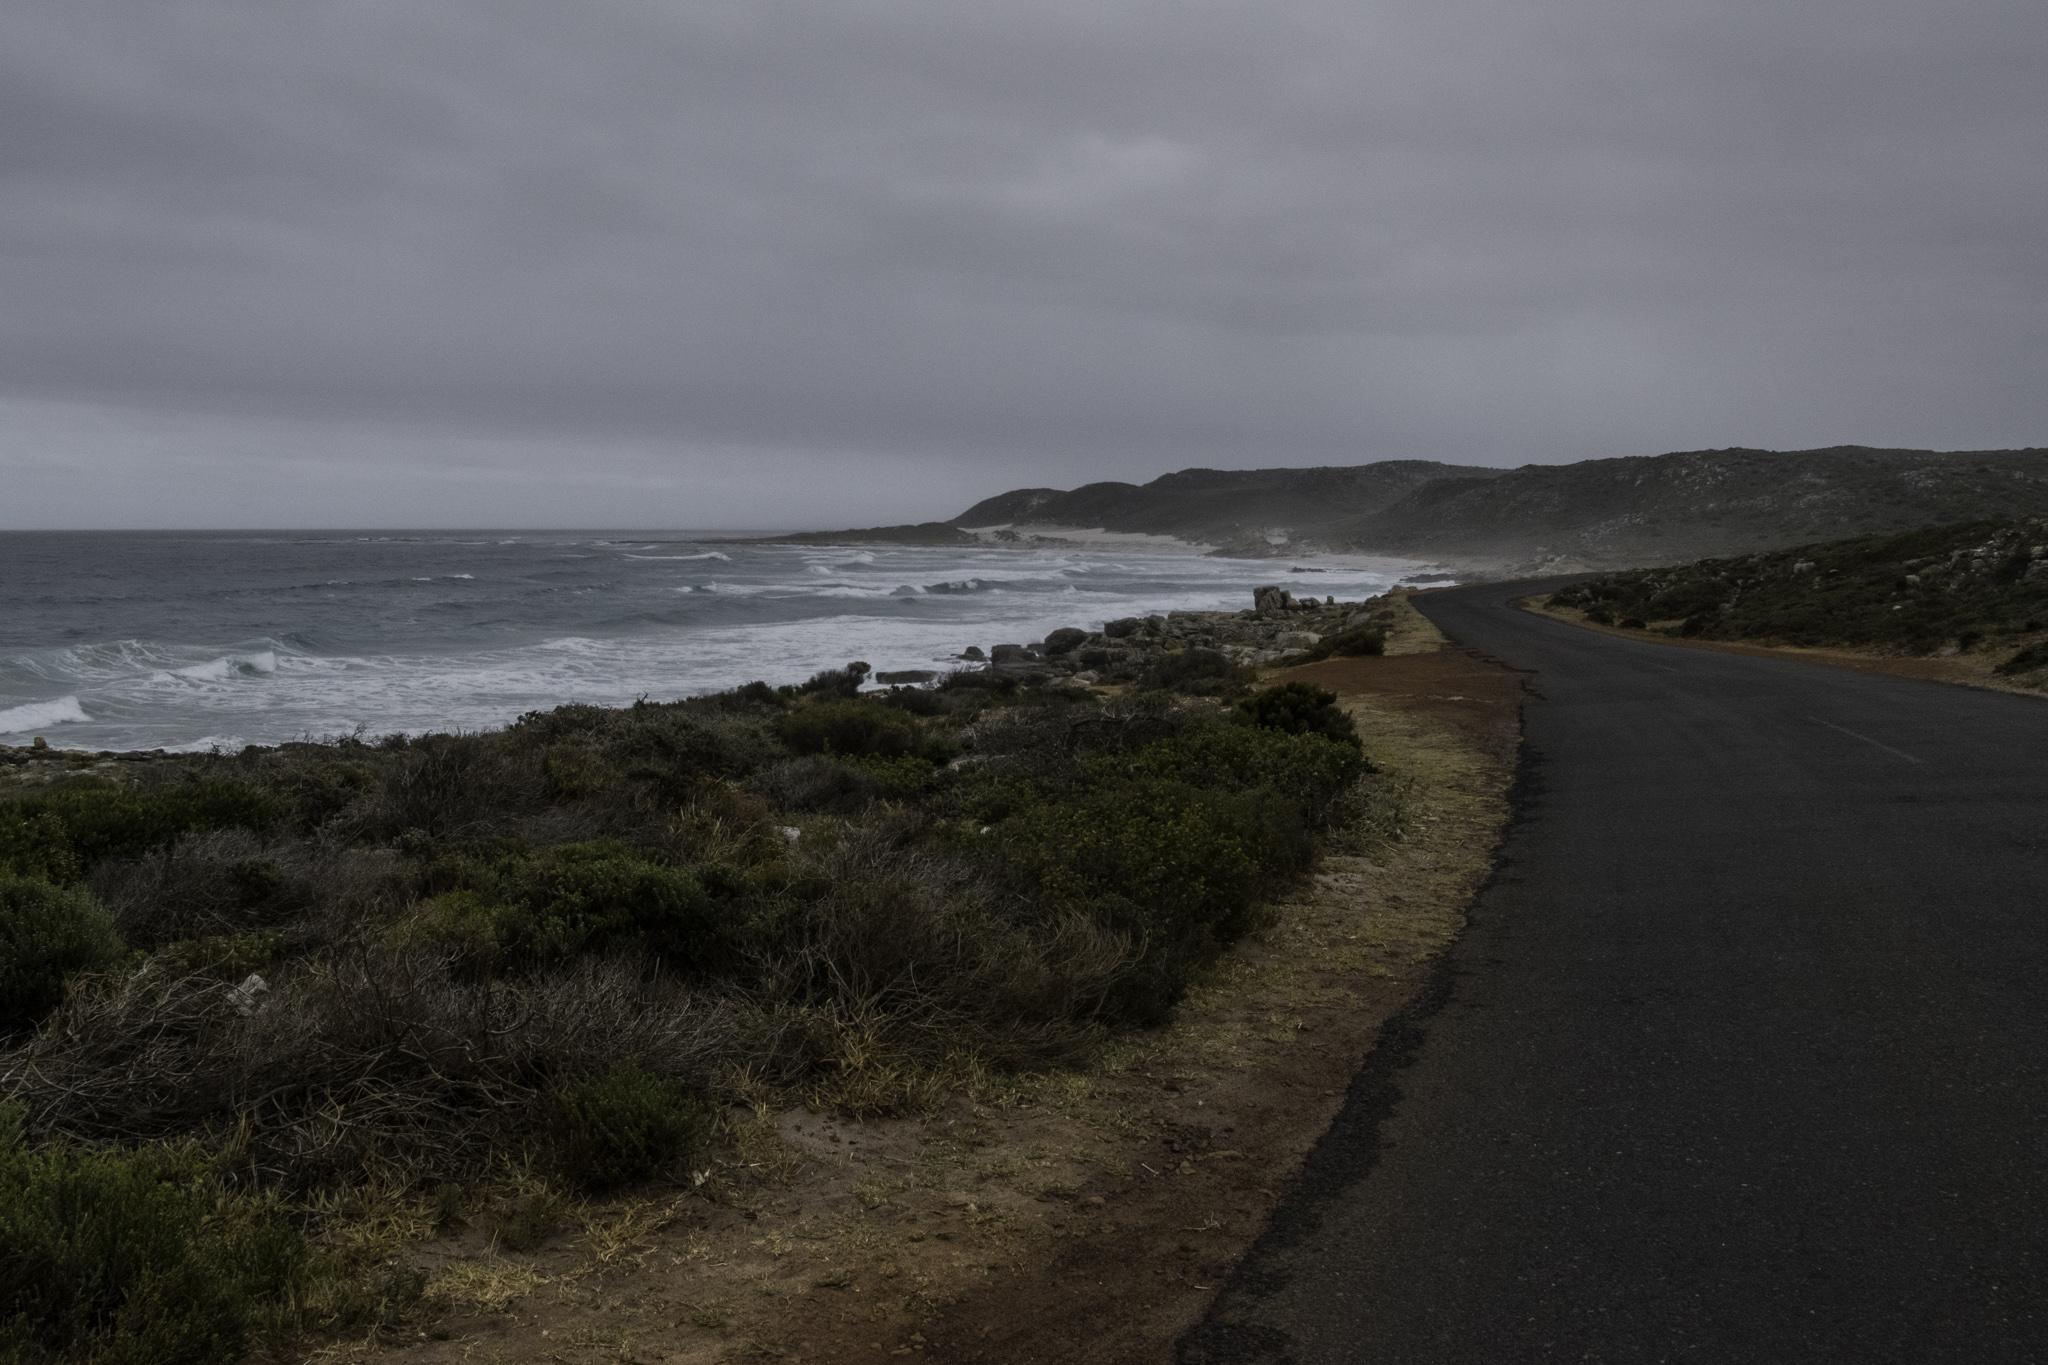 Auf dem Weg zum Kap der guten Hoffnung